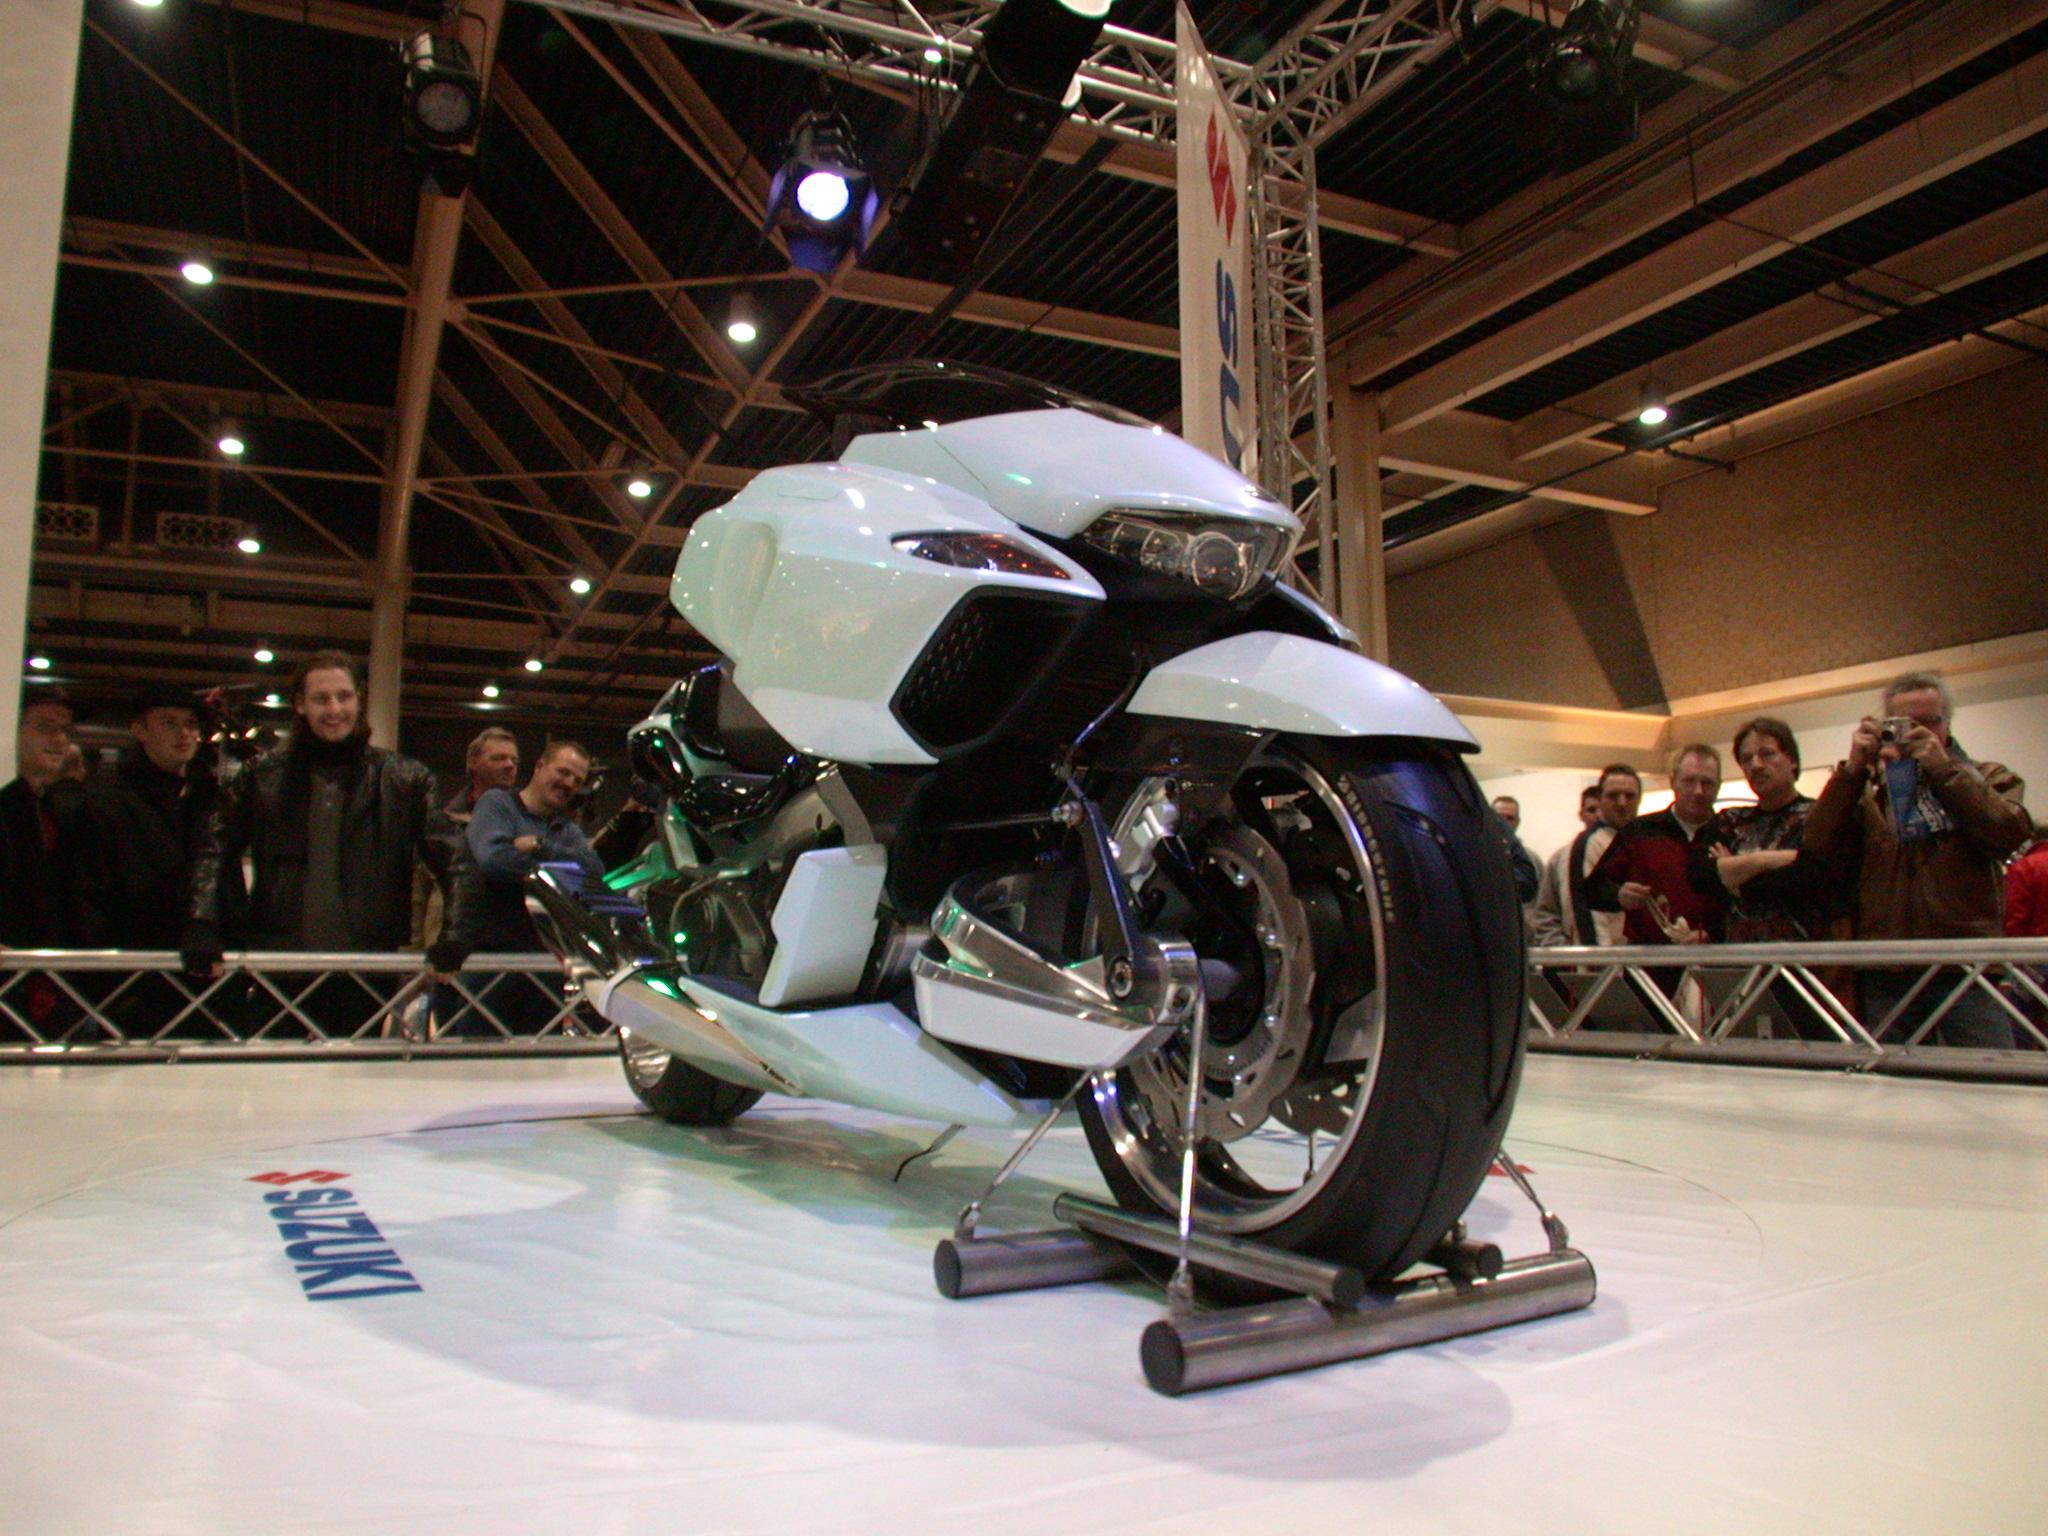 bike show motor motorbike futuristic design black white chrome